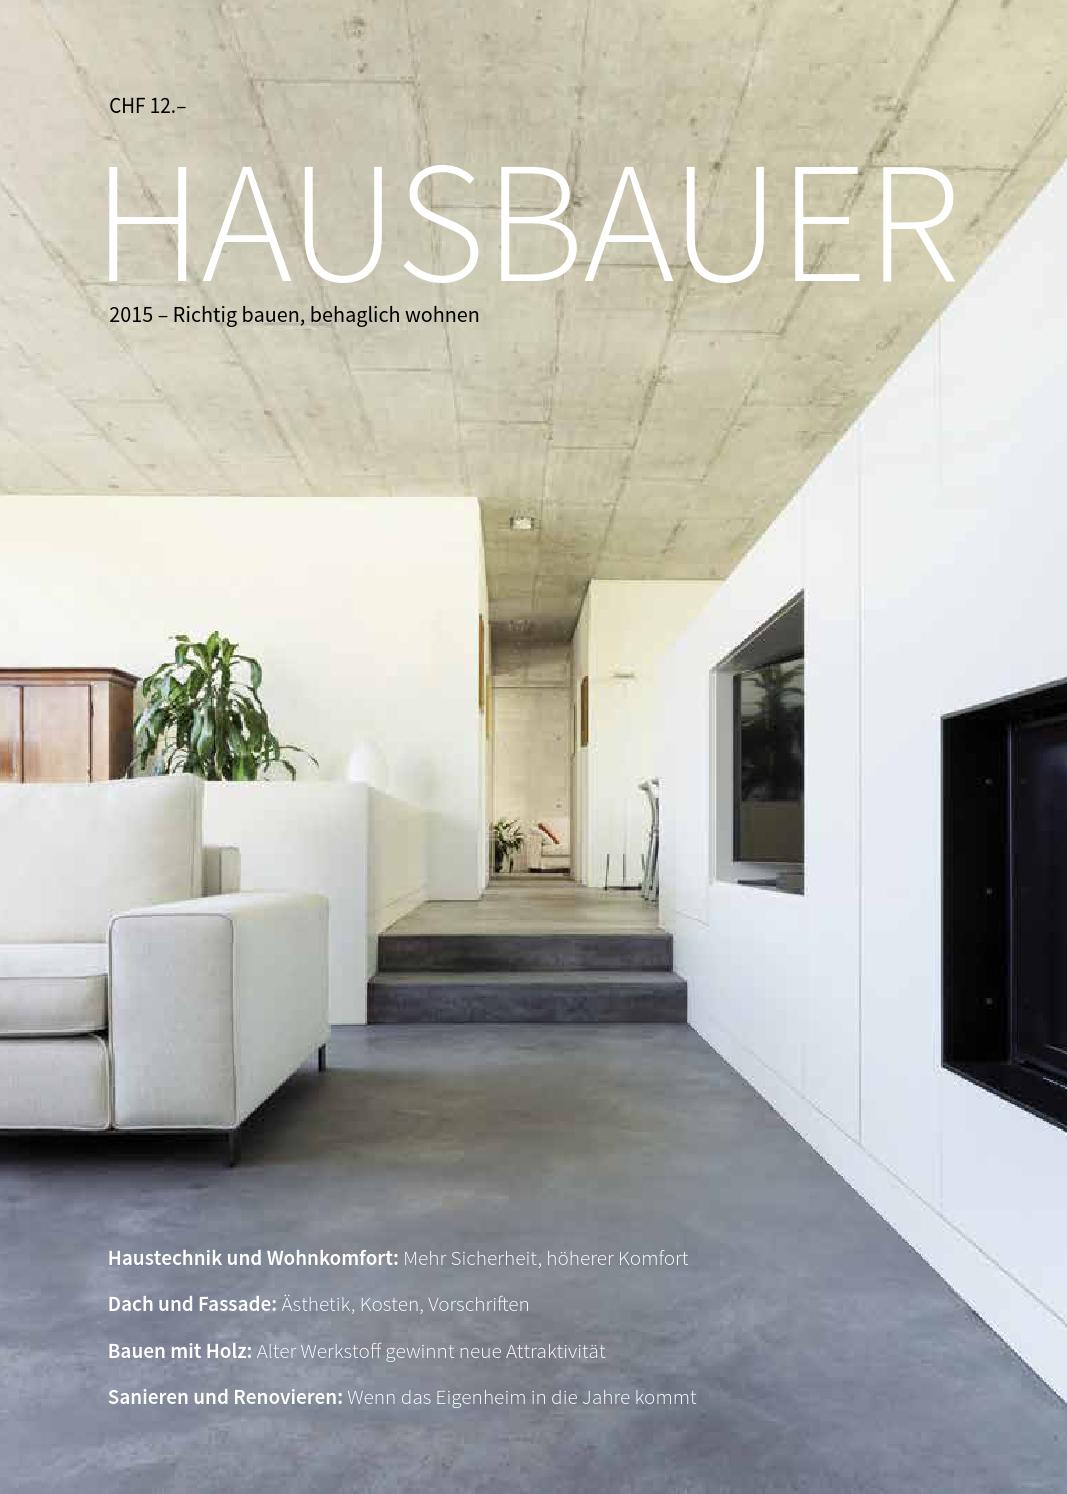 Hausbauer 2015 By MetroComm AG   Issuu